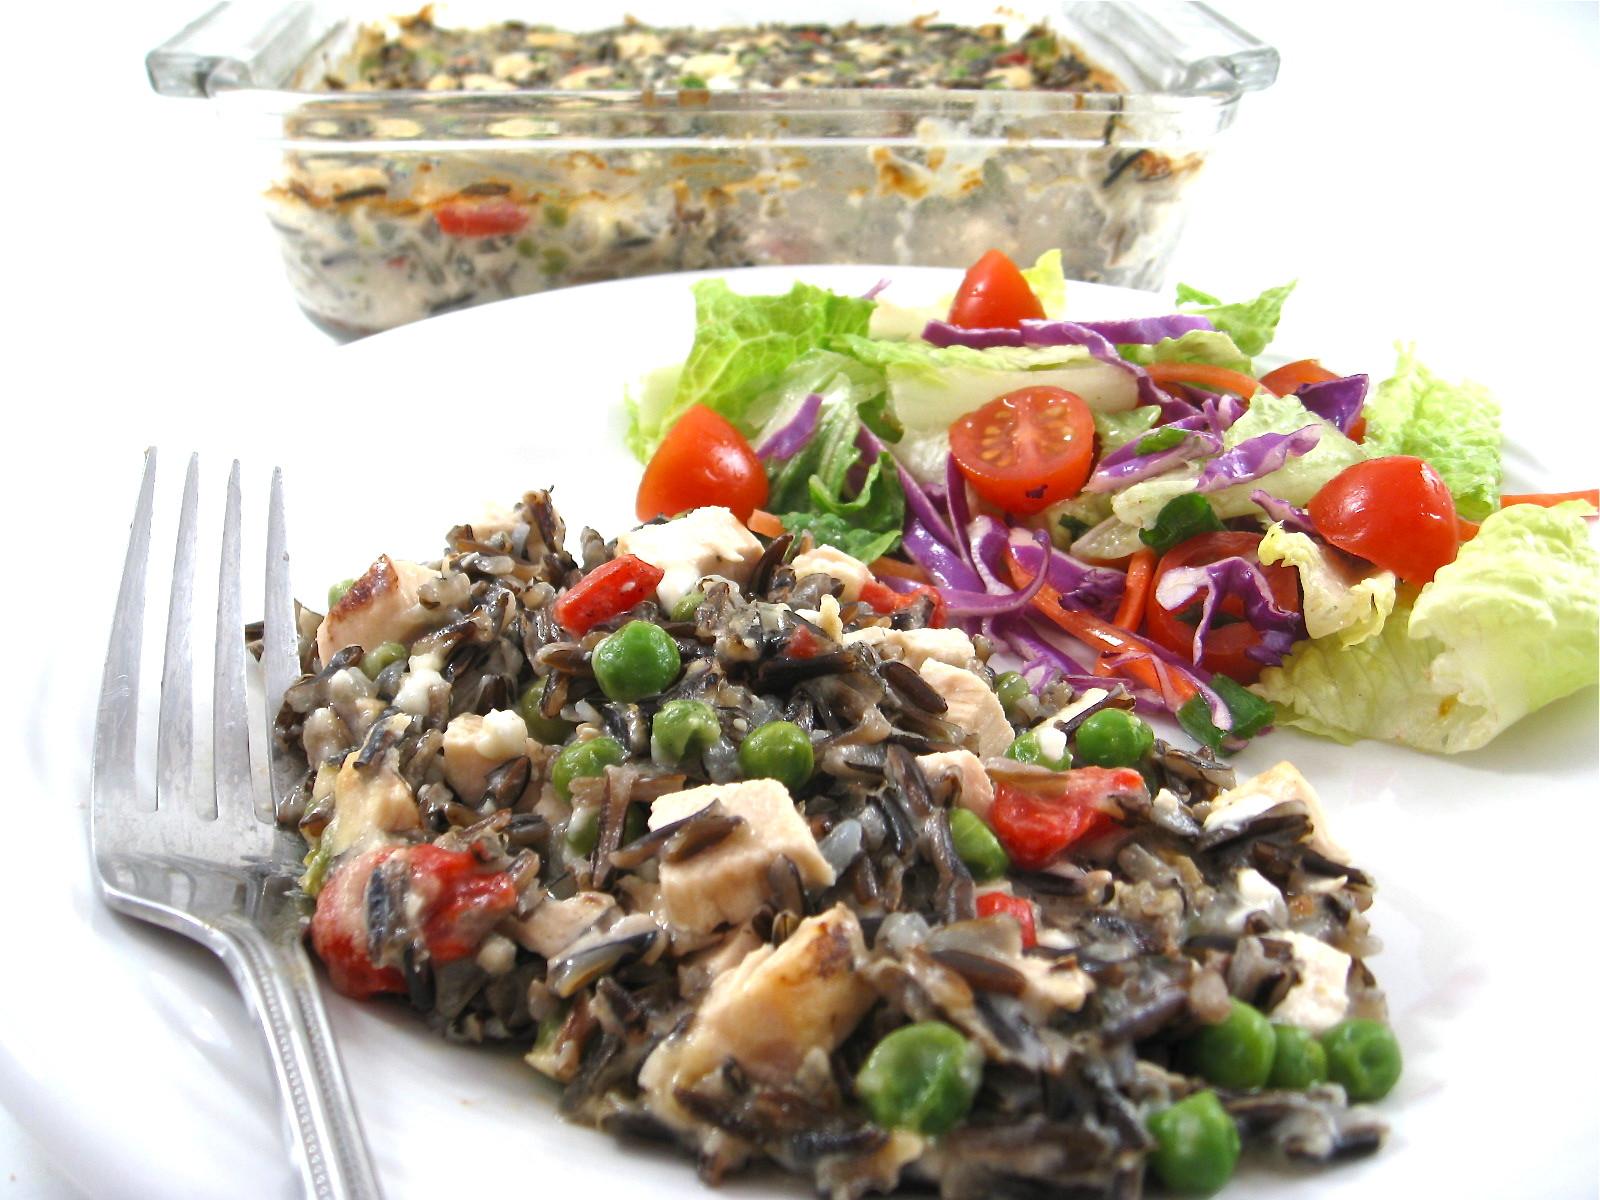 Healthy Chicken And Wild Rice Casserole  Skinny Chicken Alfredo and Wild Rice Casserole with Weight